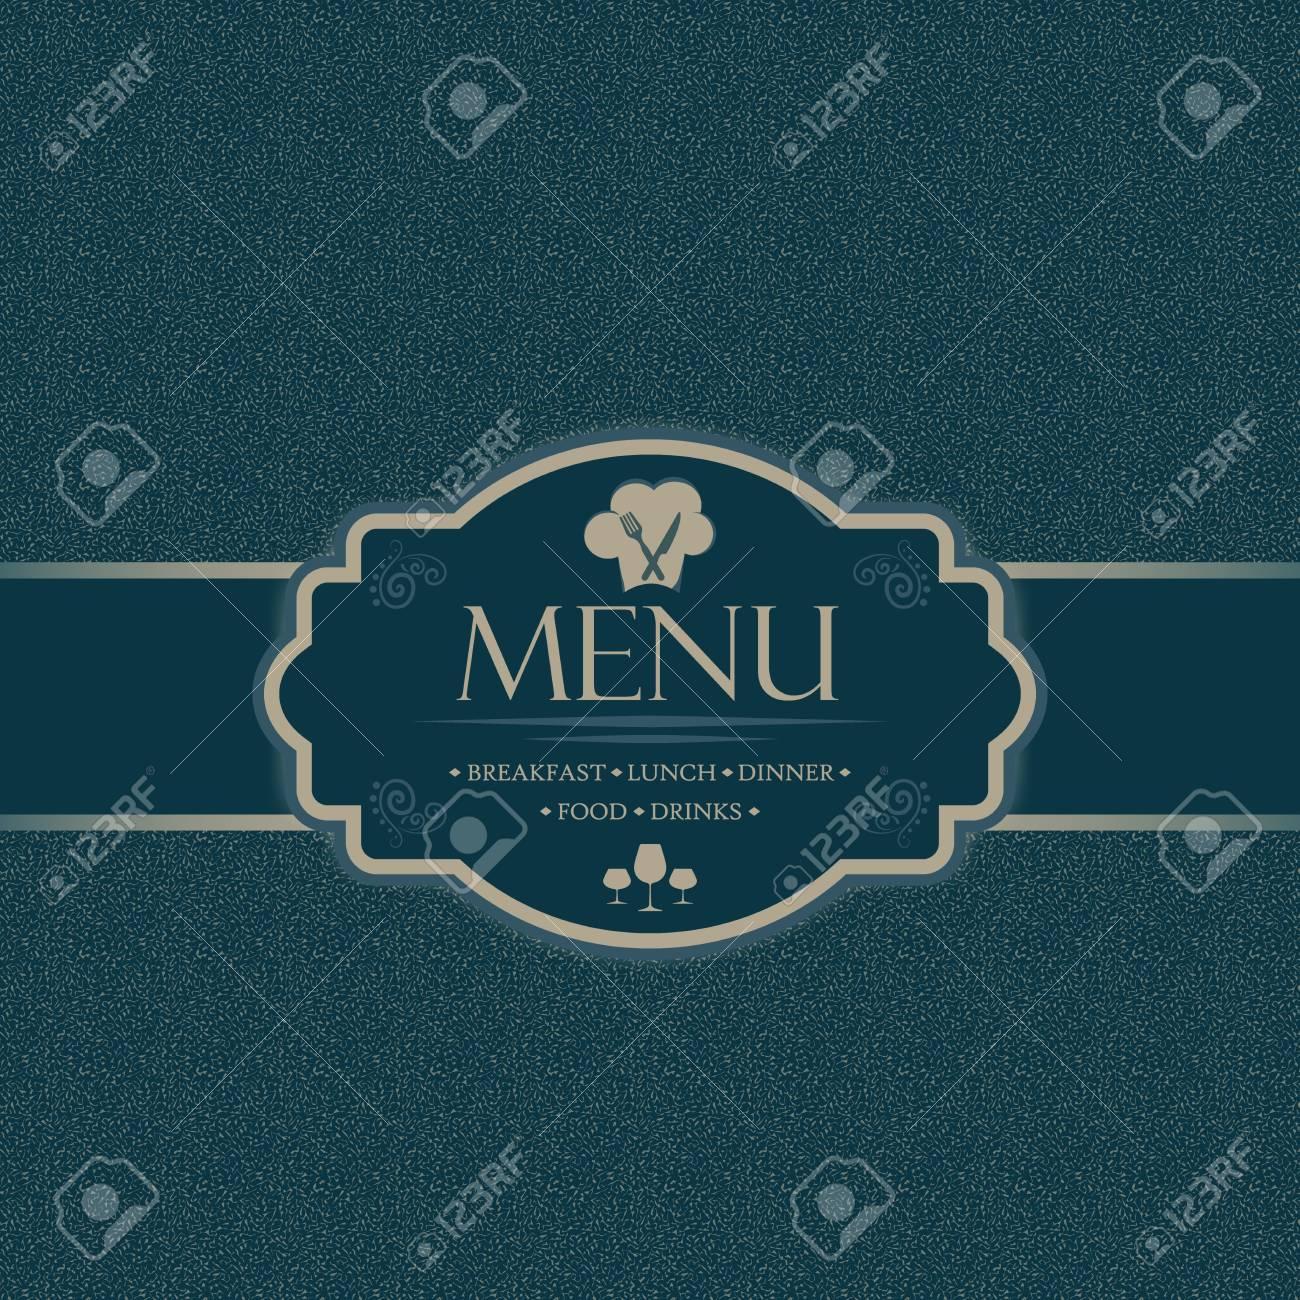 menu template for restaurants bars and beverages breakfast